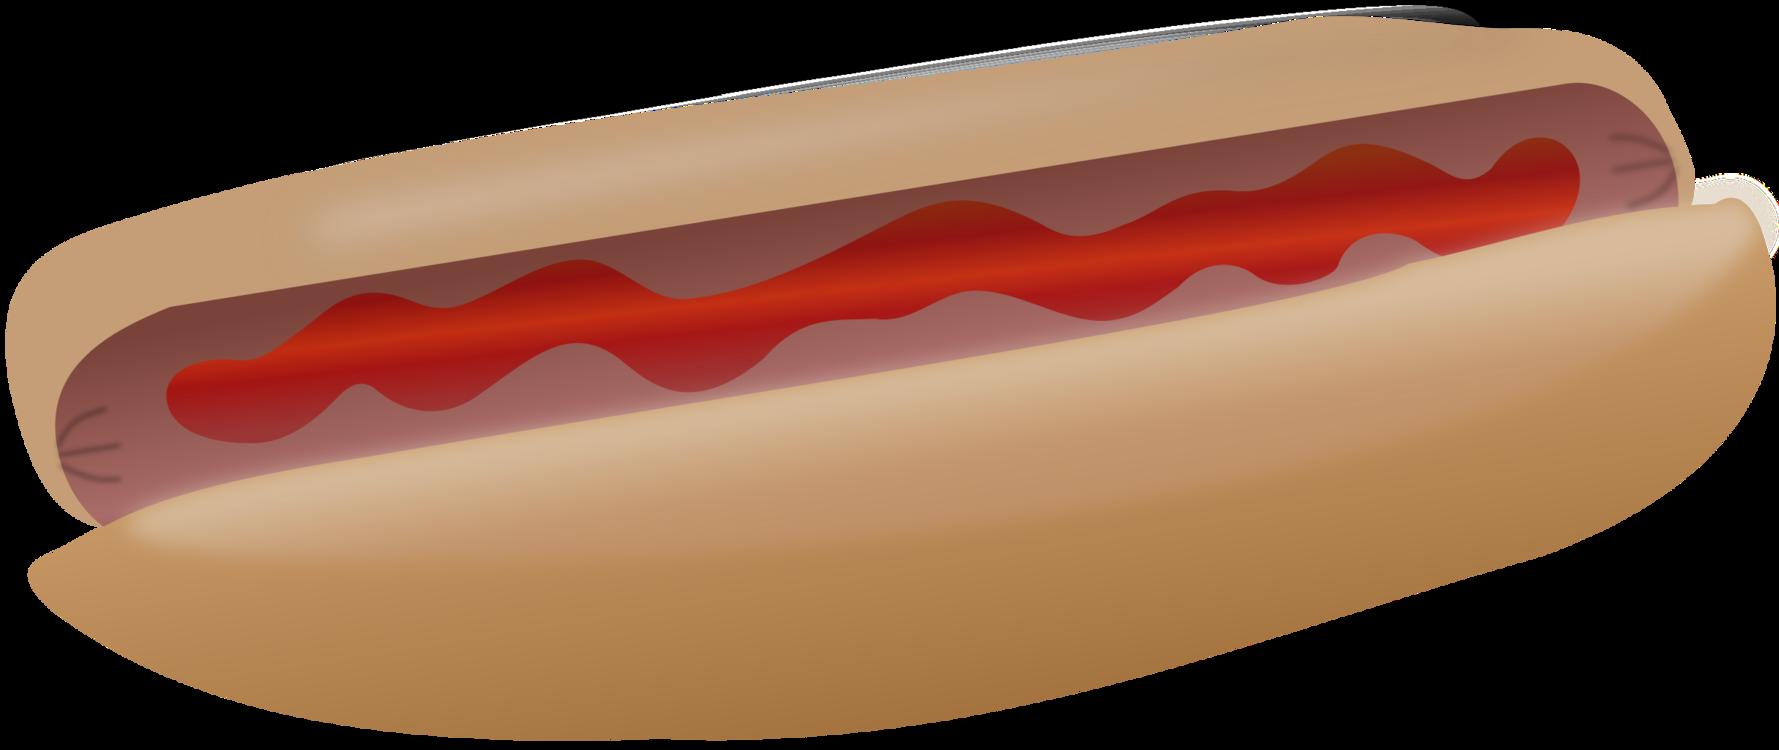 Hot Dog,Frankfurter Würstchen,Hot Dog Bun